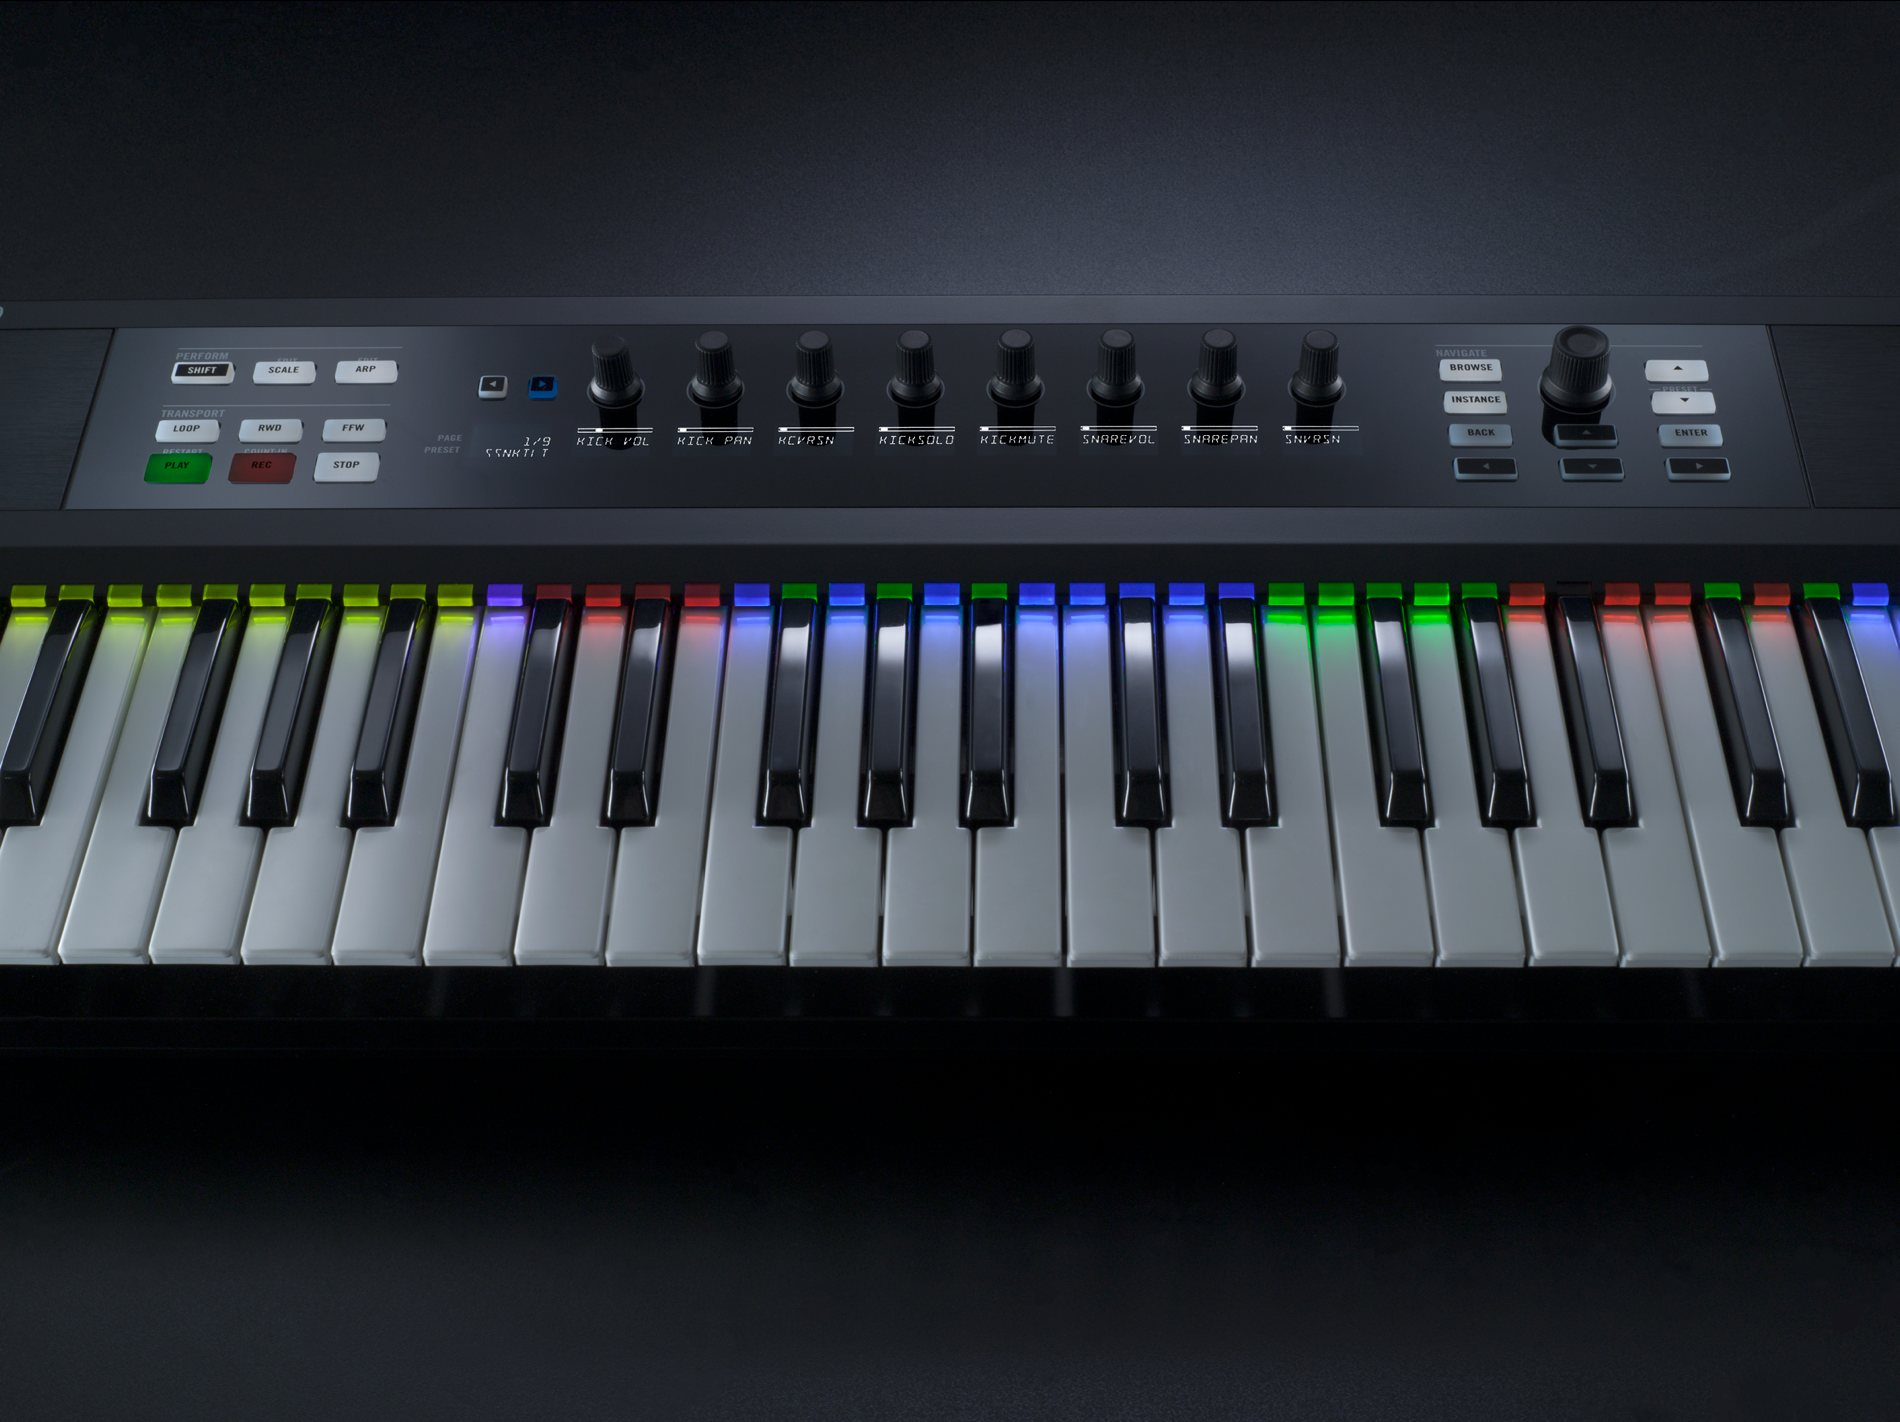 ni officially reveals komplete 10 kontrol keyboards details gallery cdm create digital music. Black Bedroom Furniture Sets. Home Design Ideas